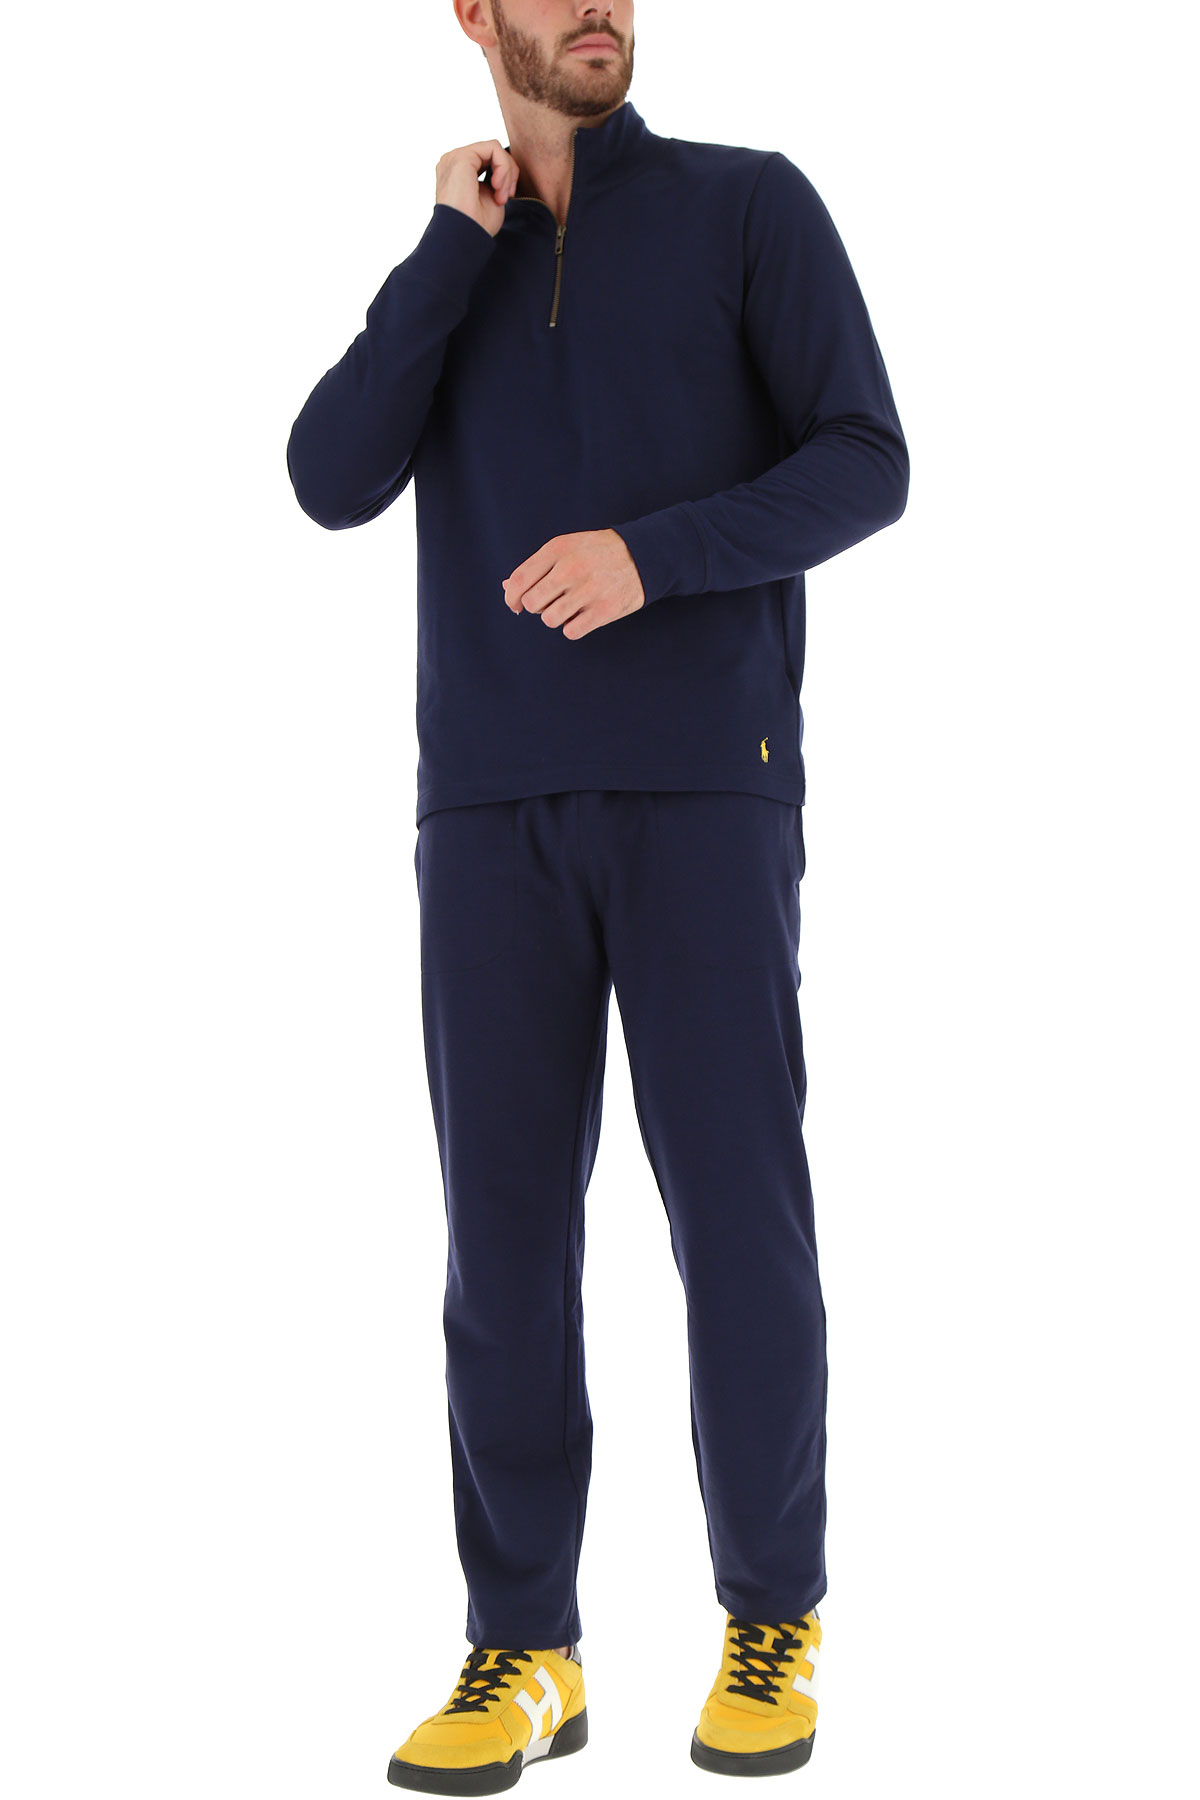 Ralph 19 Amarillo Hombres Azul Marino Ropa invierno Lauren Para 2018 Otoño wgPwpqr